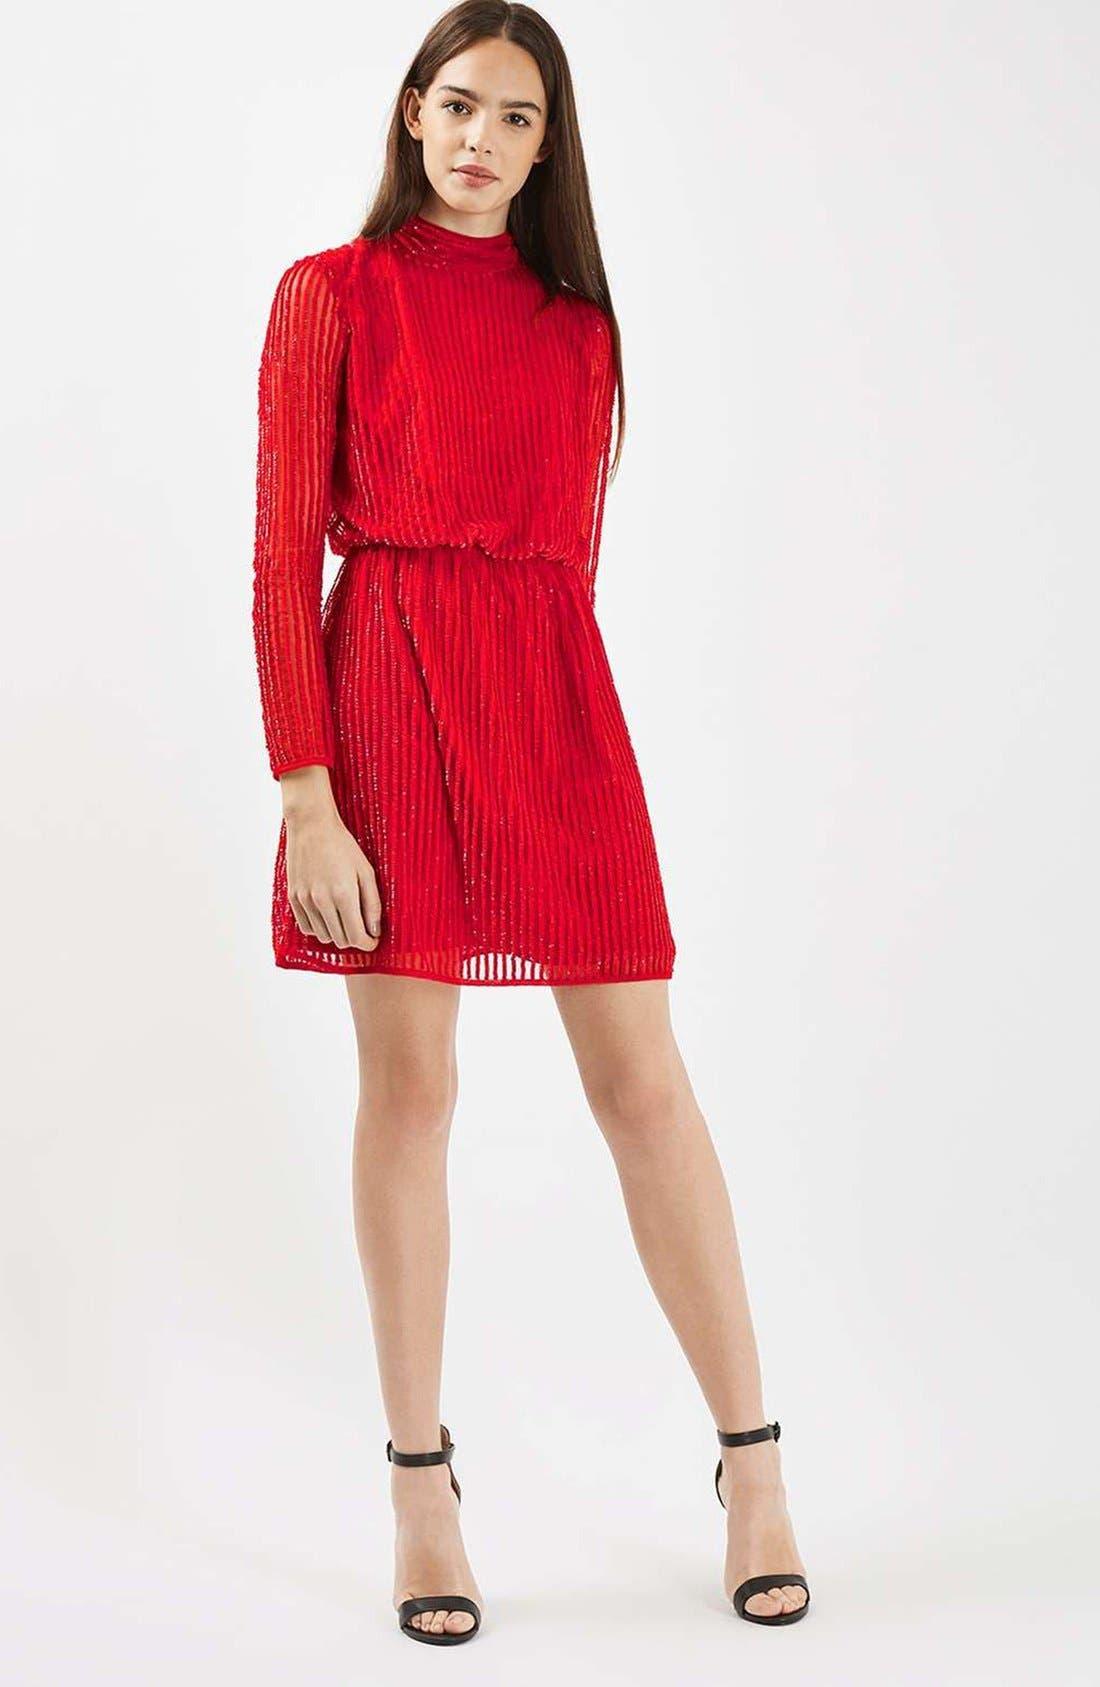 Alternate Image 1 Selected - Topshop Sequin Blouson Dress